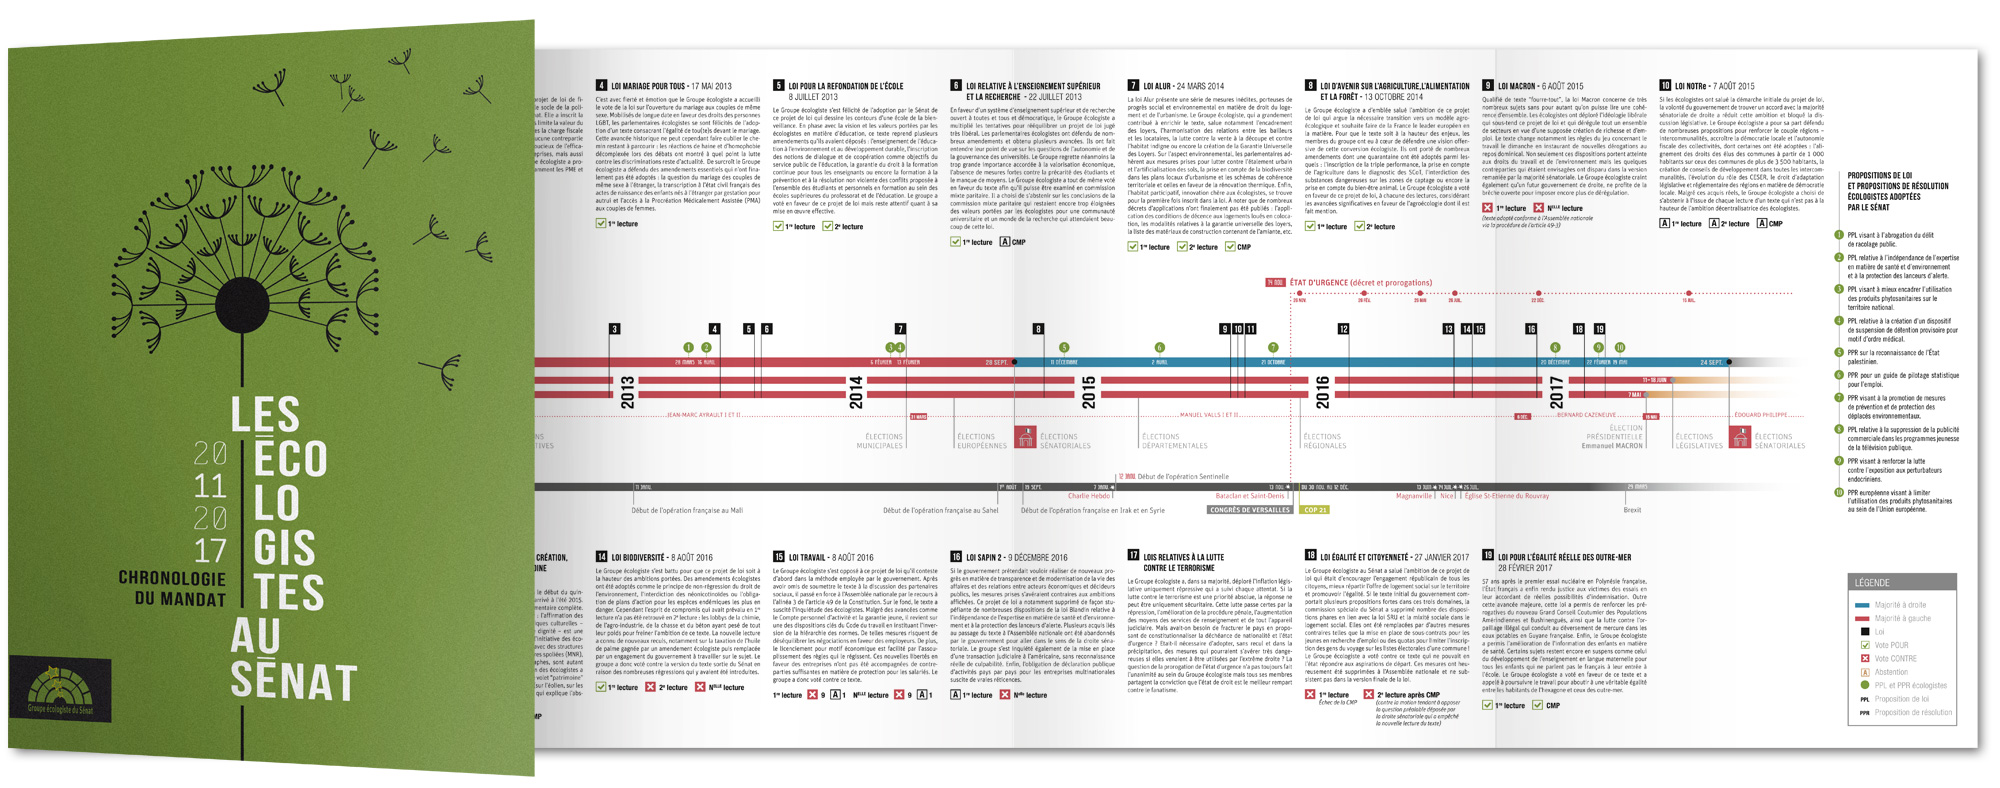 Timeline du bilan du groupe ecologiste du Sénat